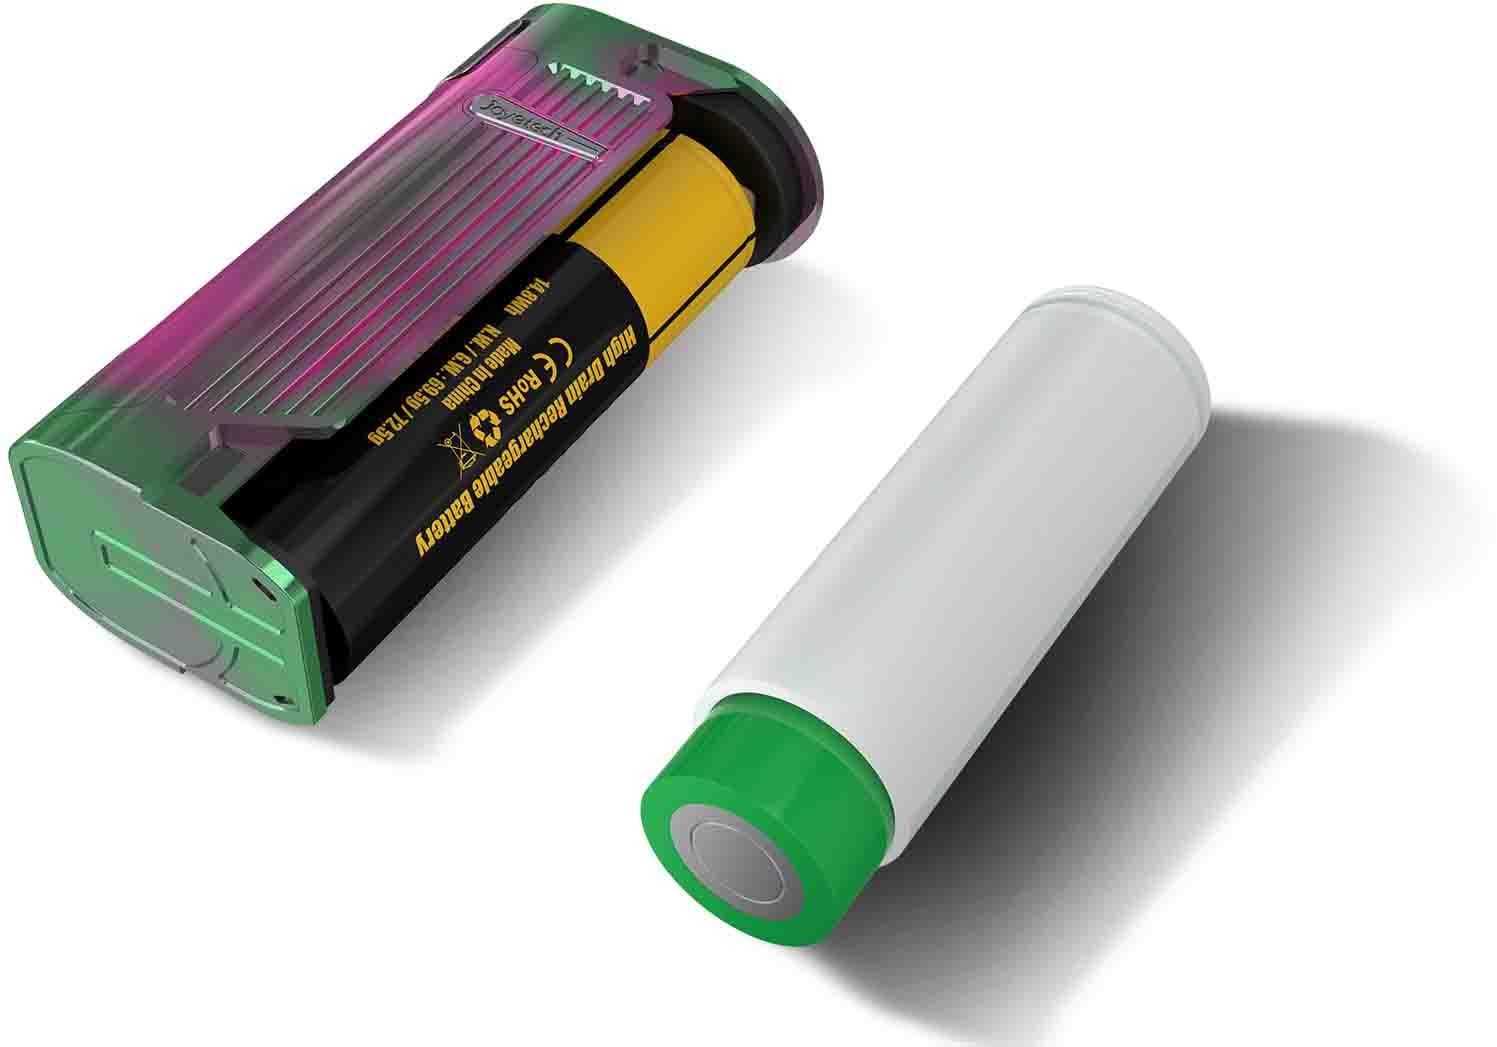 Kompatibilní s bateriemi 21700 a 18650 Joyetech ESPION Solo 80W